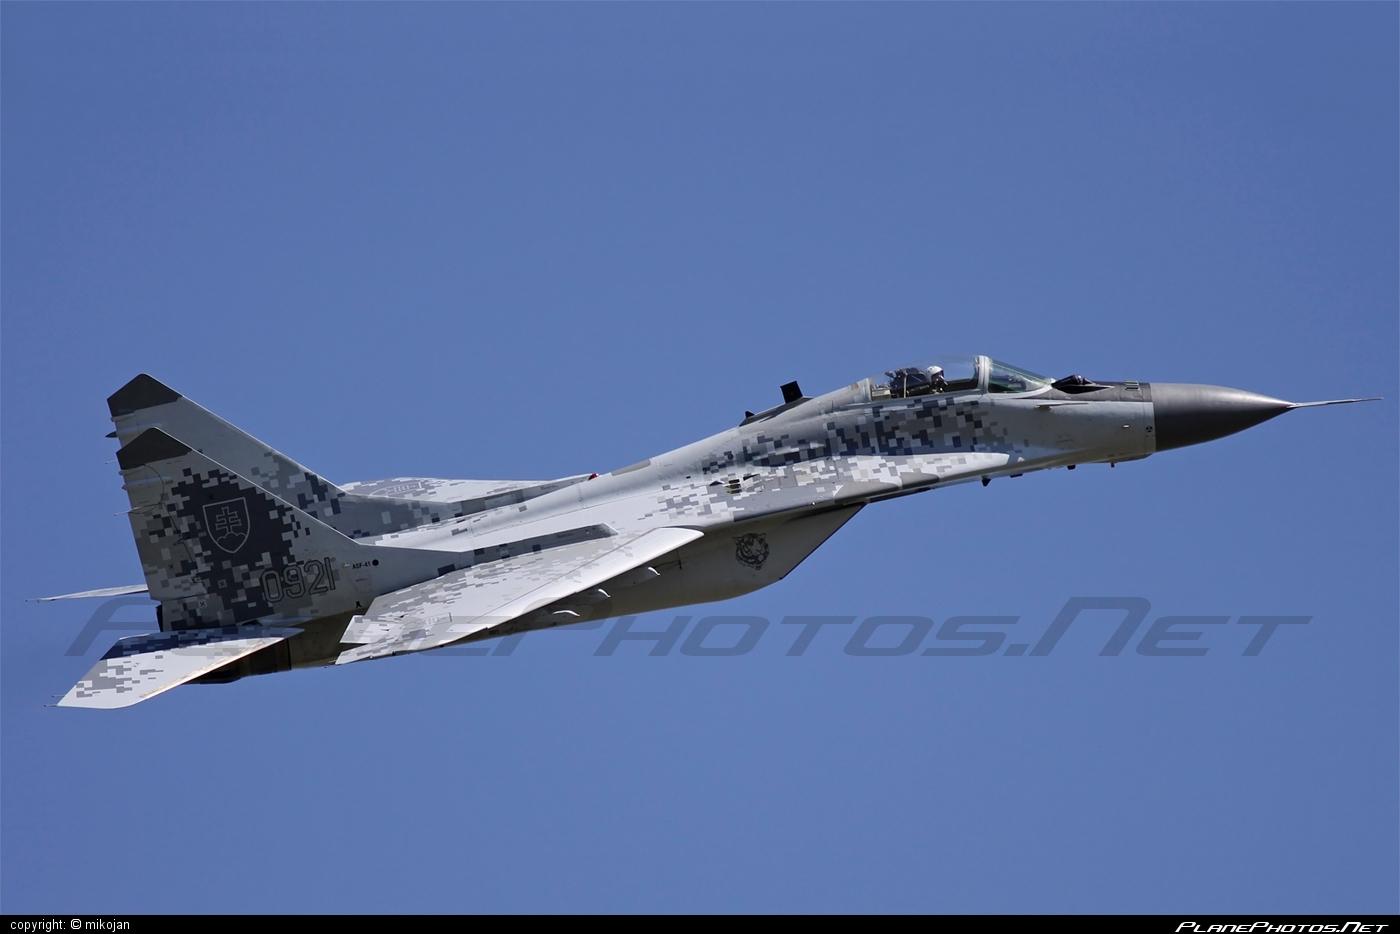 Vzdušné sily OS SR (Slovak Air Force) Mikoyan-Gurevich MiG-29AS - 0921 #mig #mig29 #mig29as #mikoyangurevich #slovakairforce #vzdusnesilyossr